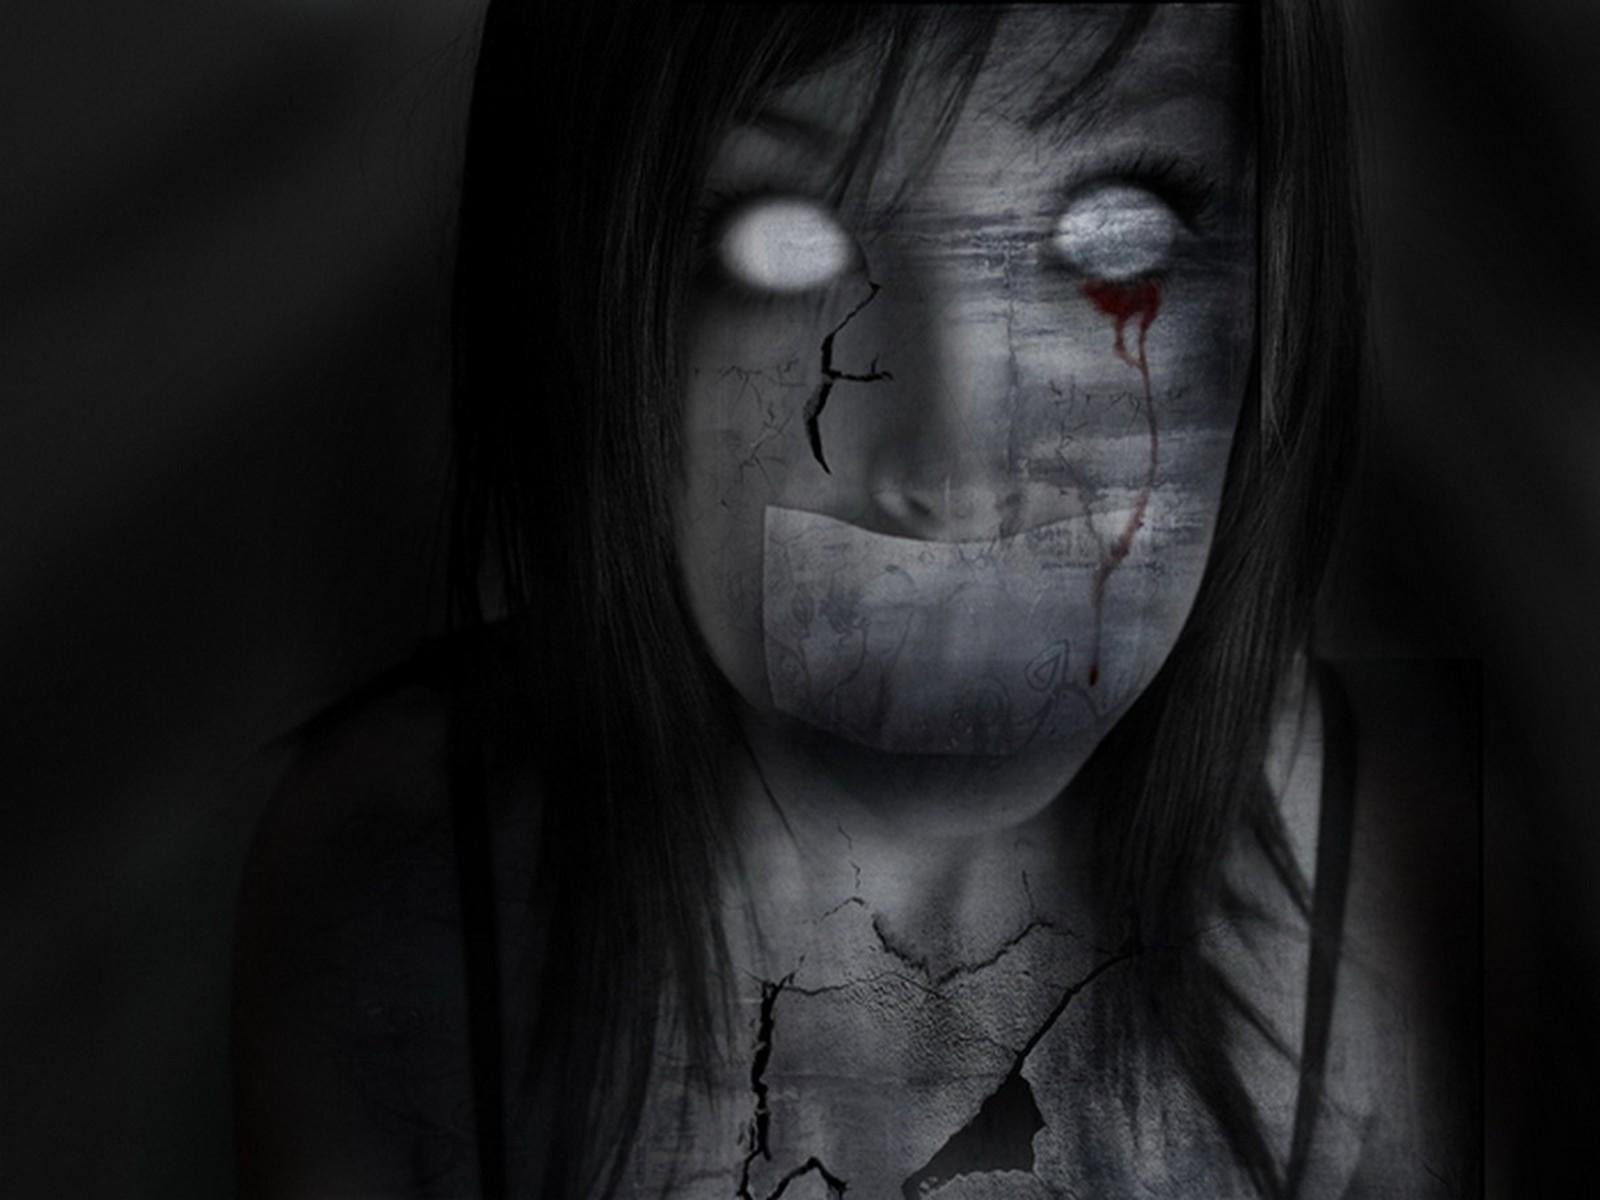 Страшные аватарки для контакта. - 31 May ...: seosemi.ucoz.net/blog/strashnye_avatarki_dlja_kontakta/2013-05-31-20